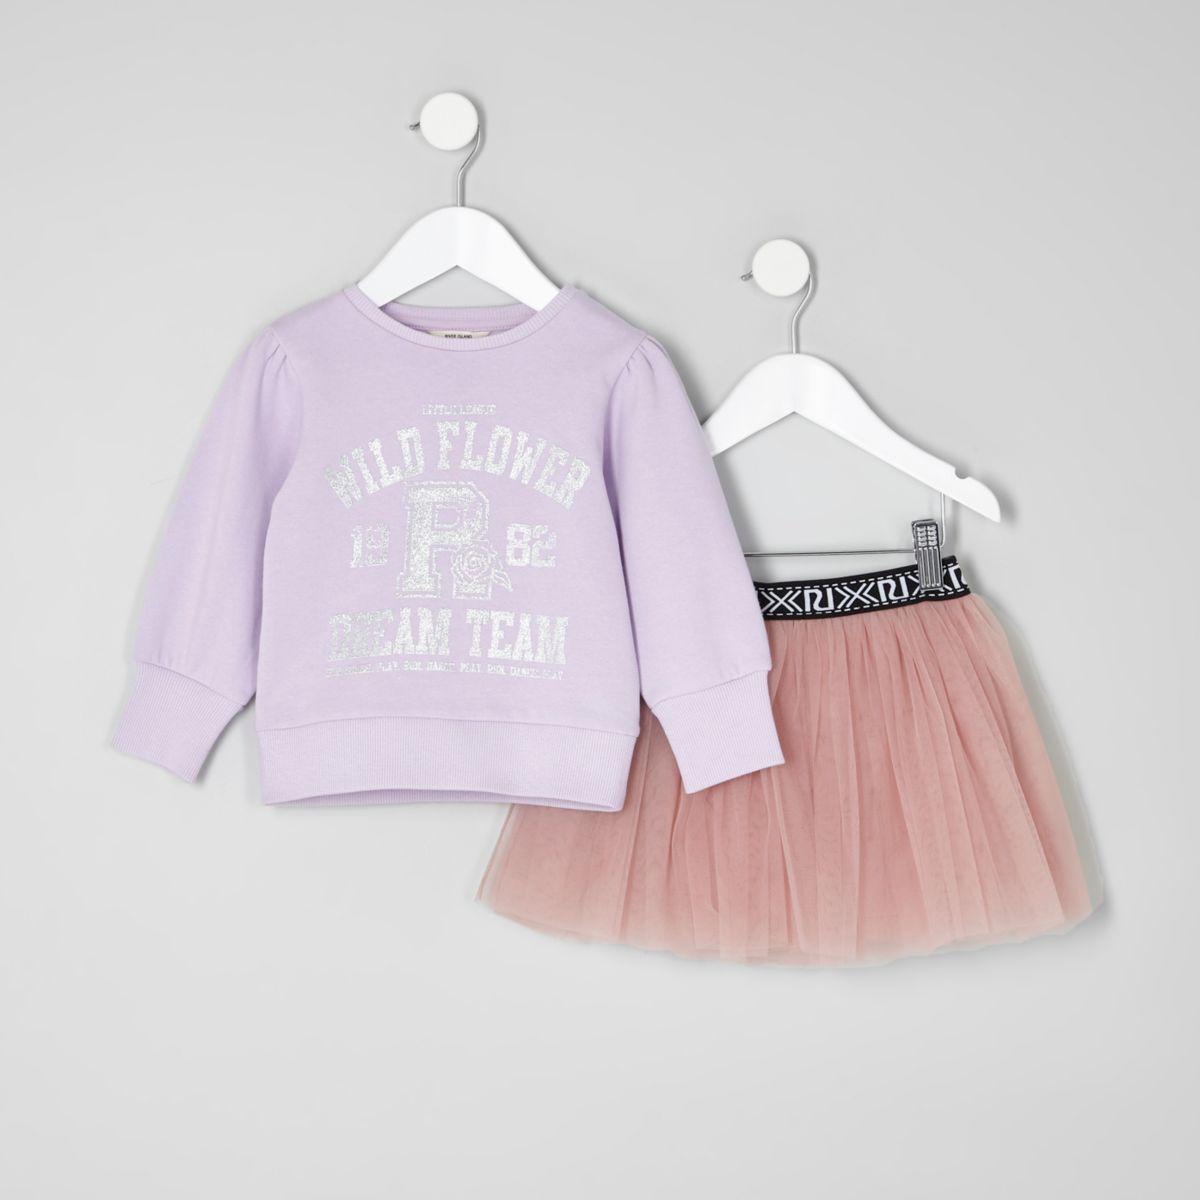 Mini girls purple sweatshirt and tutu outfit